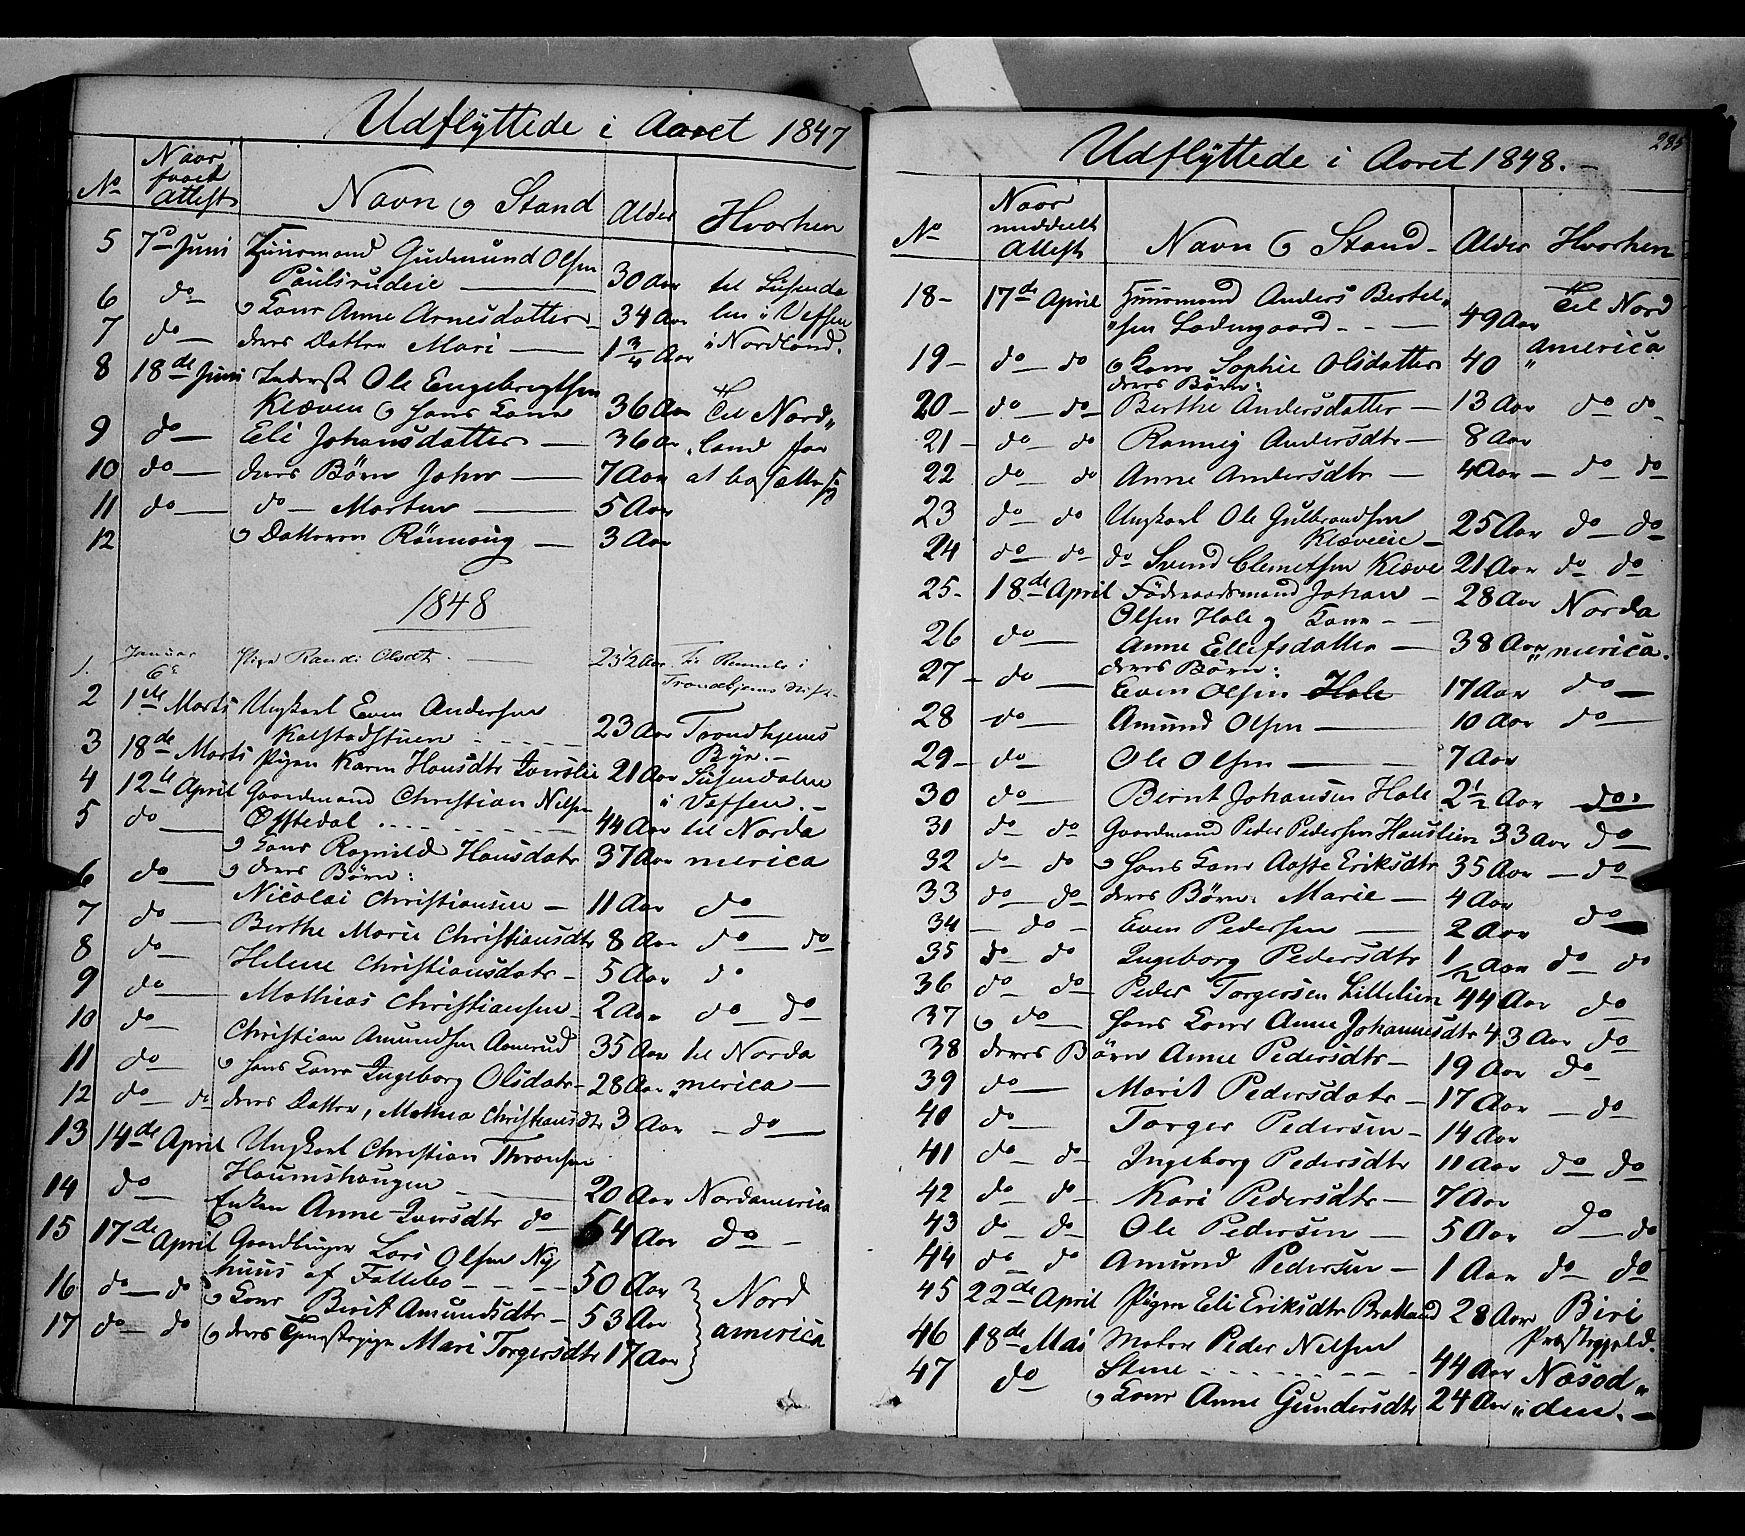 SAH, Gausdal prestekontor, Ministerialbok nr. 7, 1840-1850, s. 285